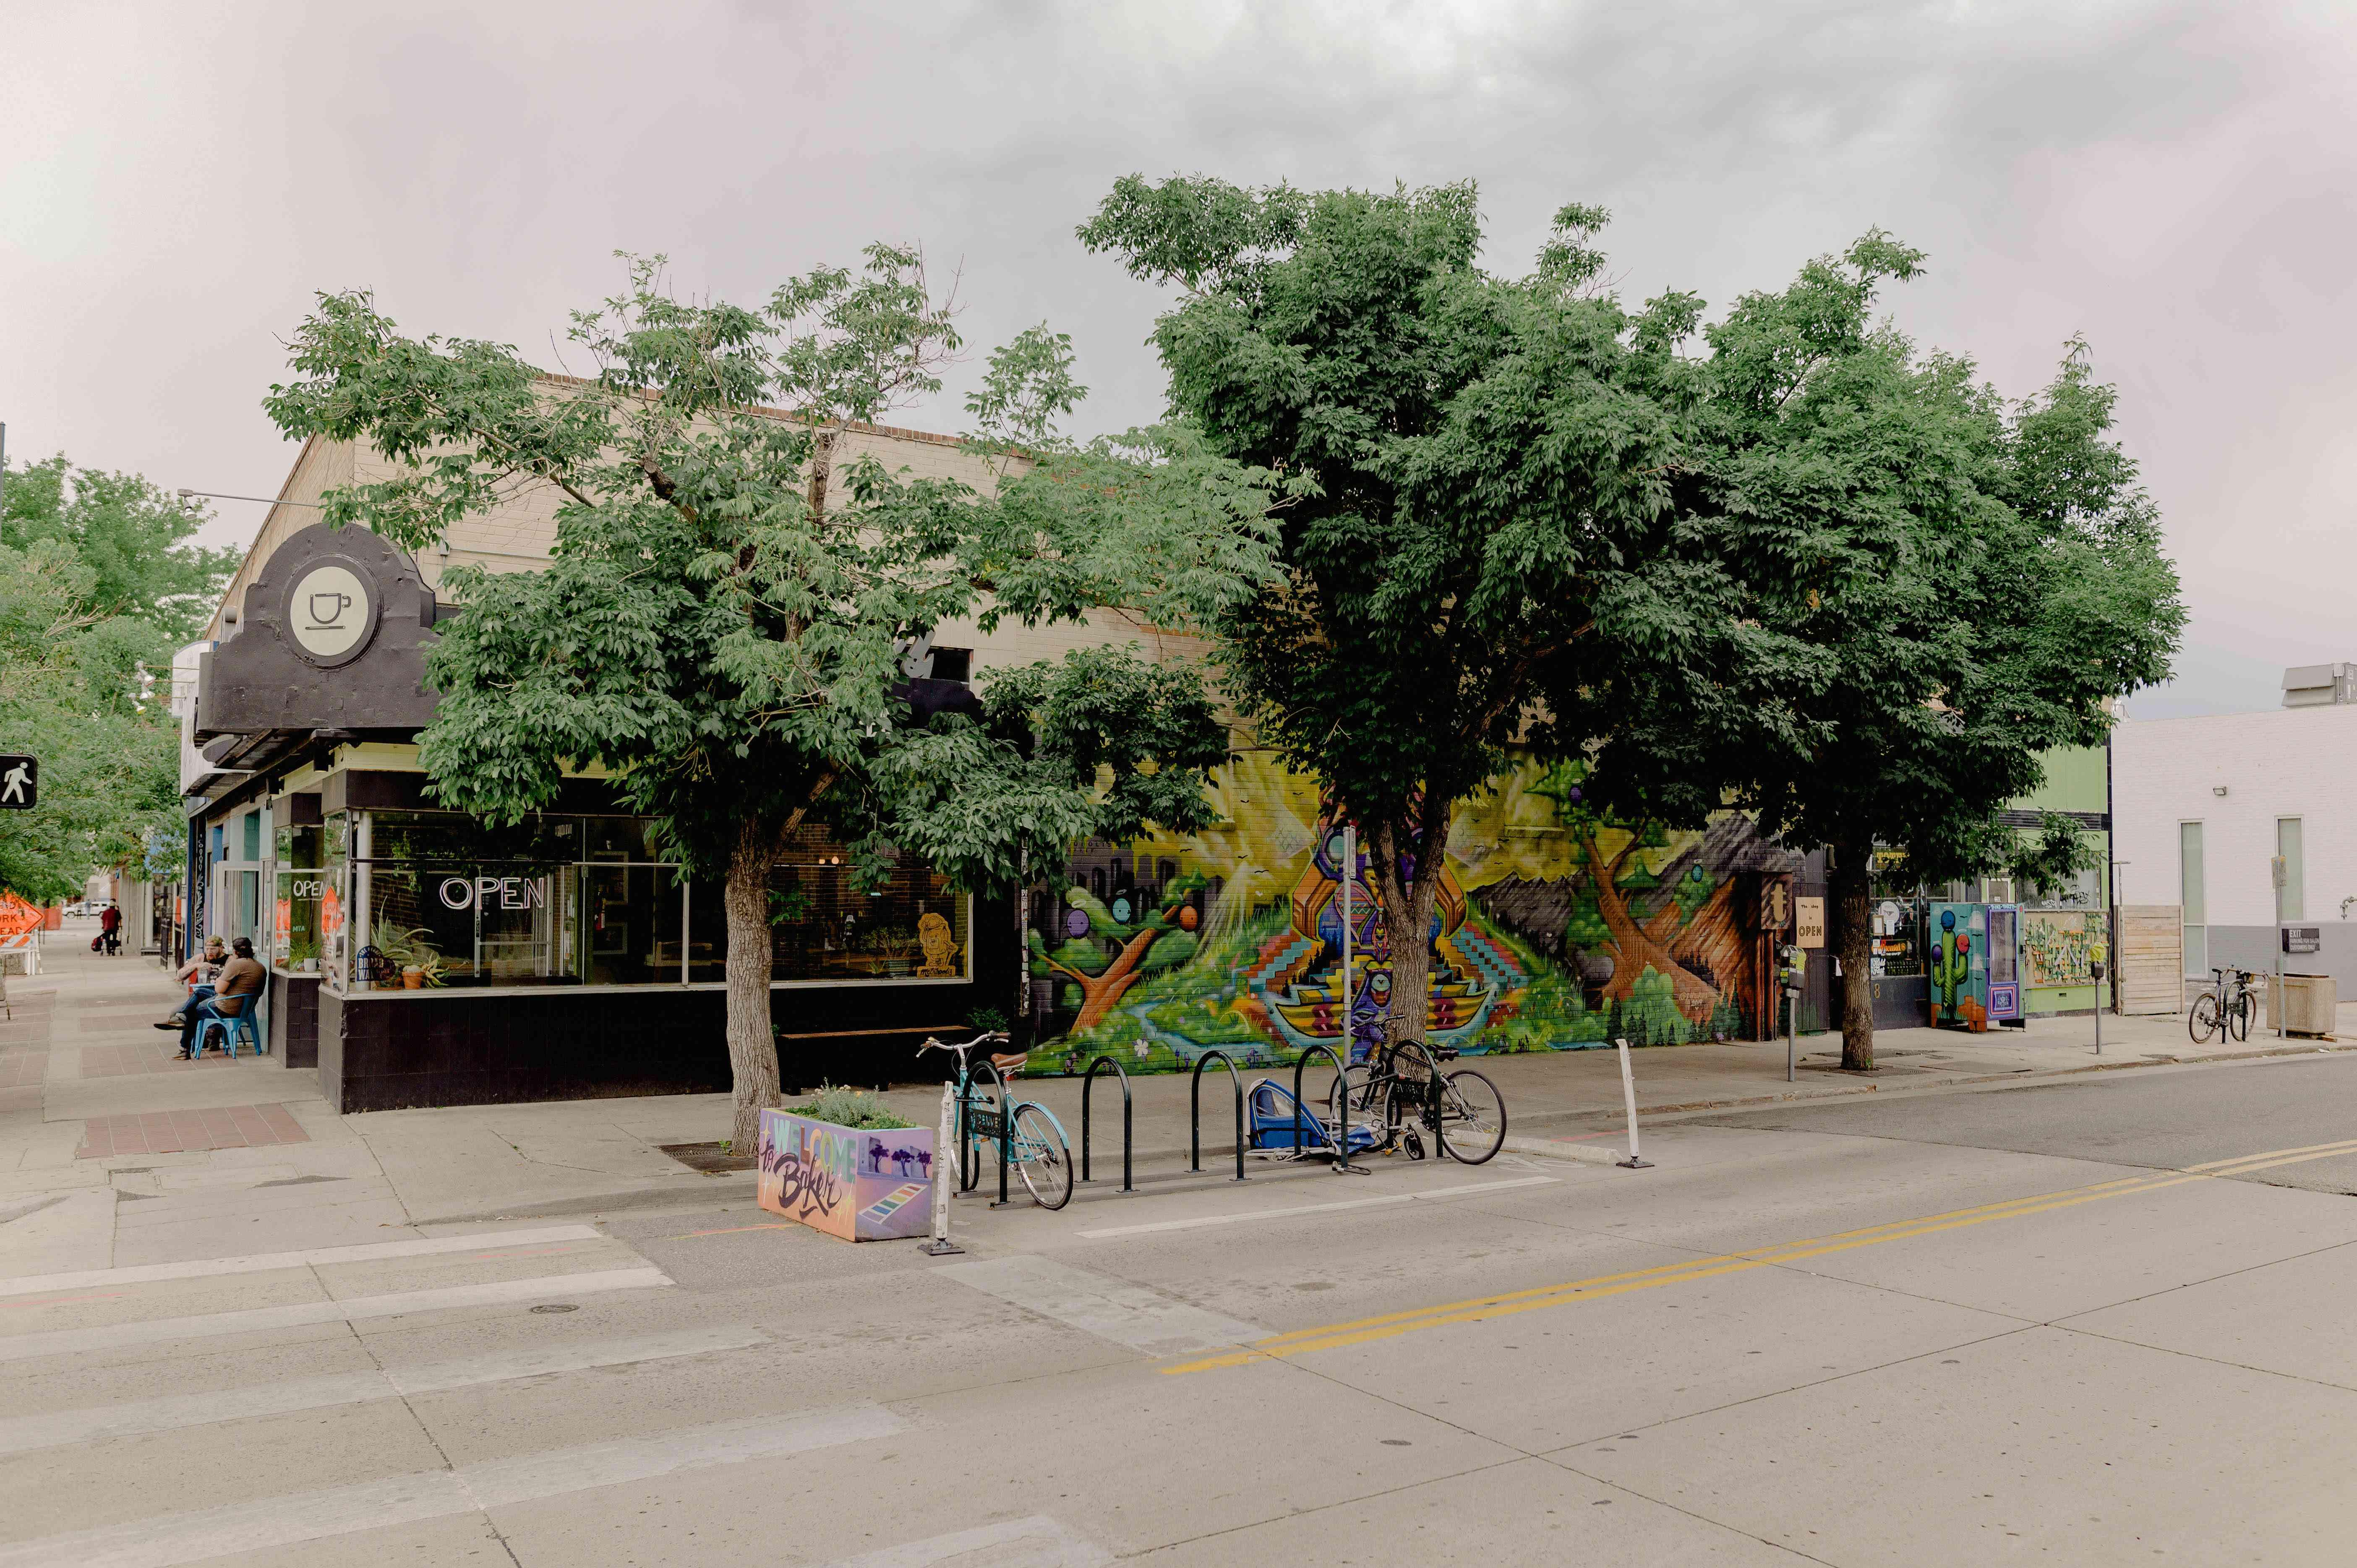 Baker/South Broadway (SoBo) in Denver